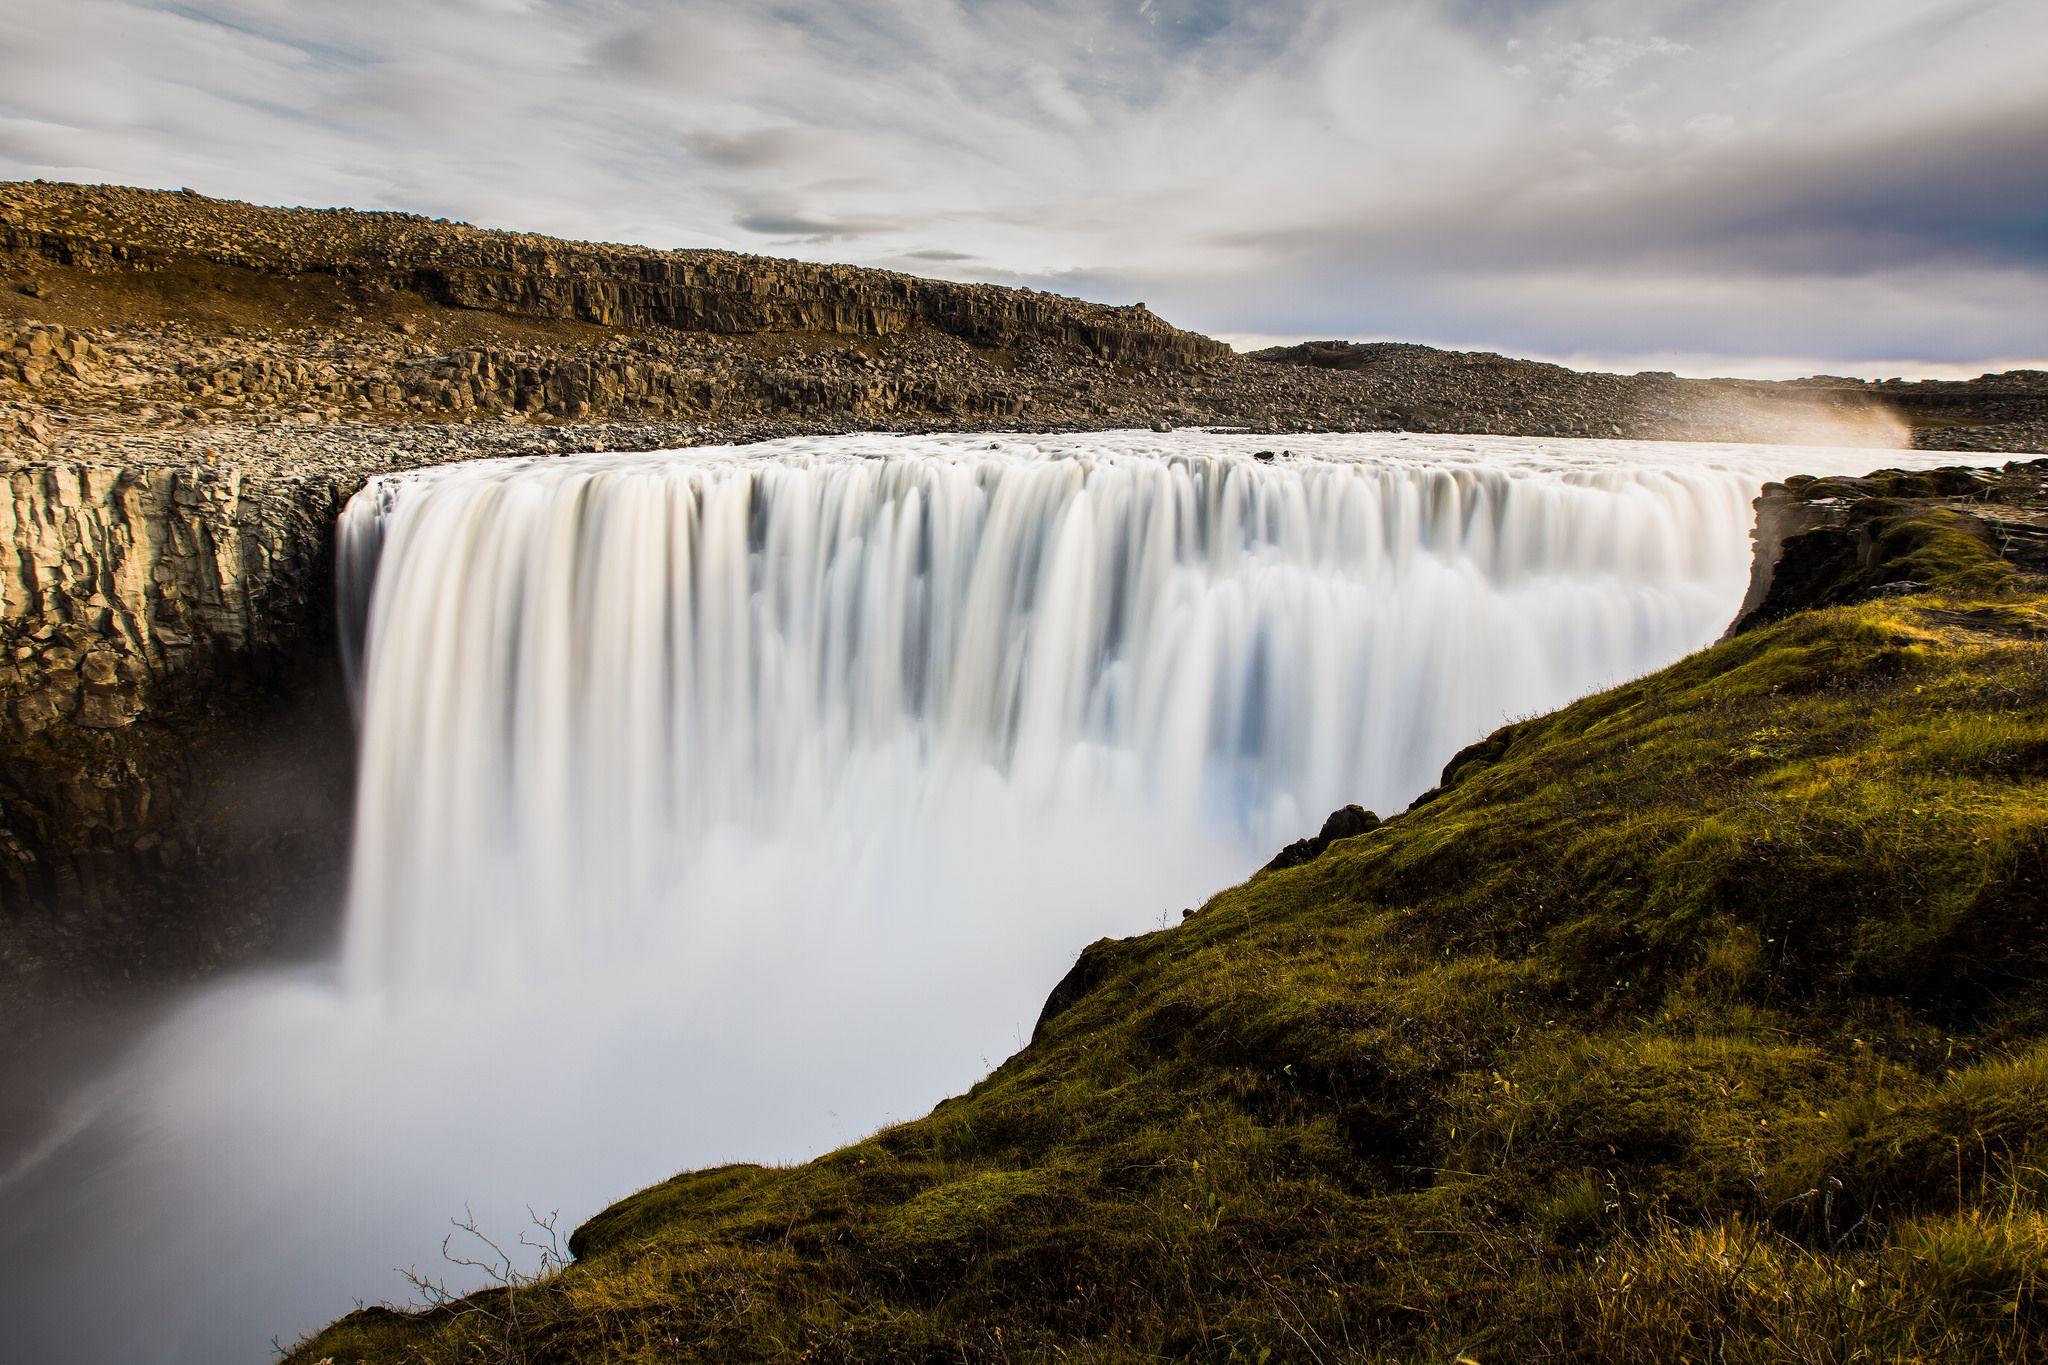 https://flic.kr/p/NKU7qB   Dettifoss, Iceland